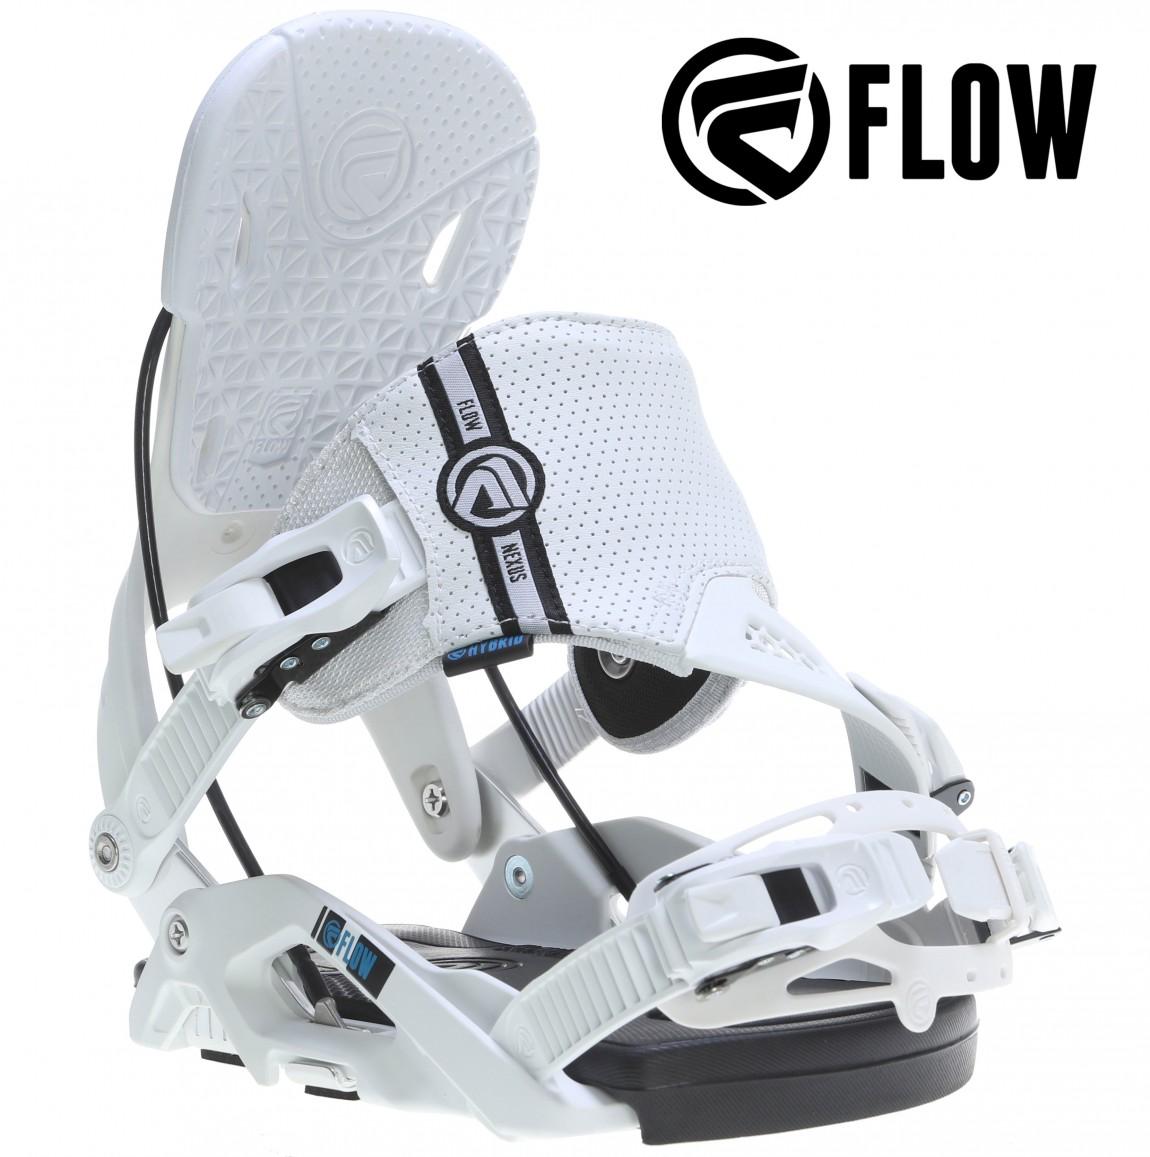 flow-nexus-hybrid-snow-bindings-white-16